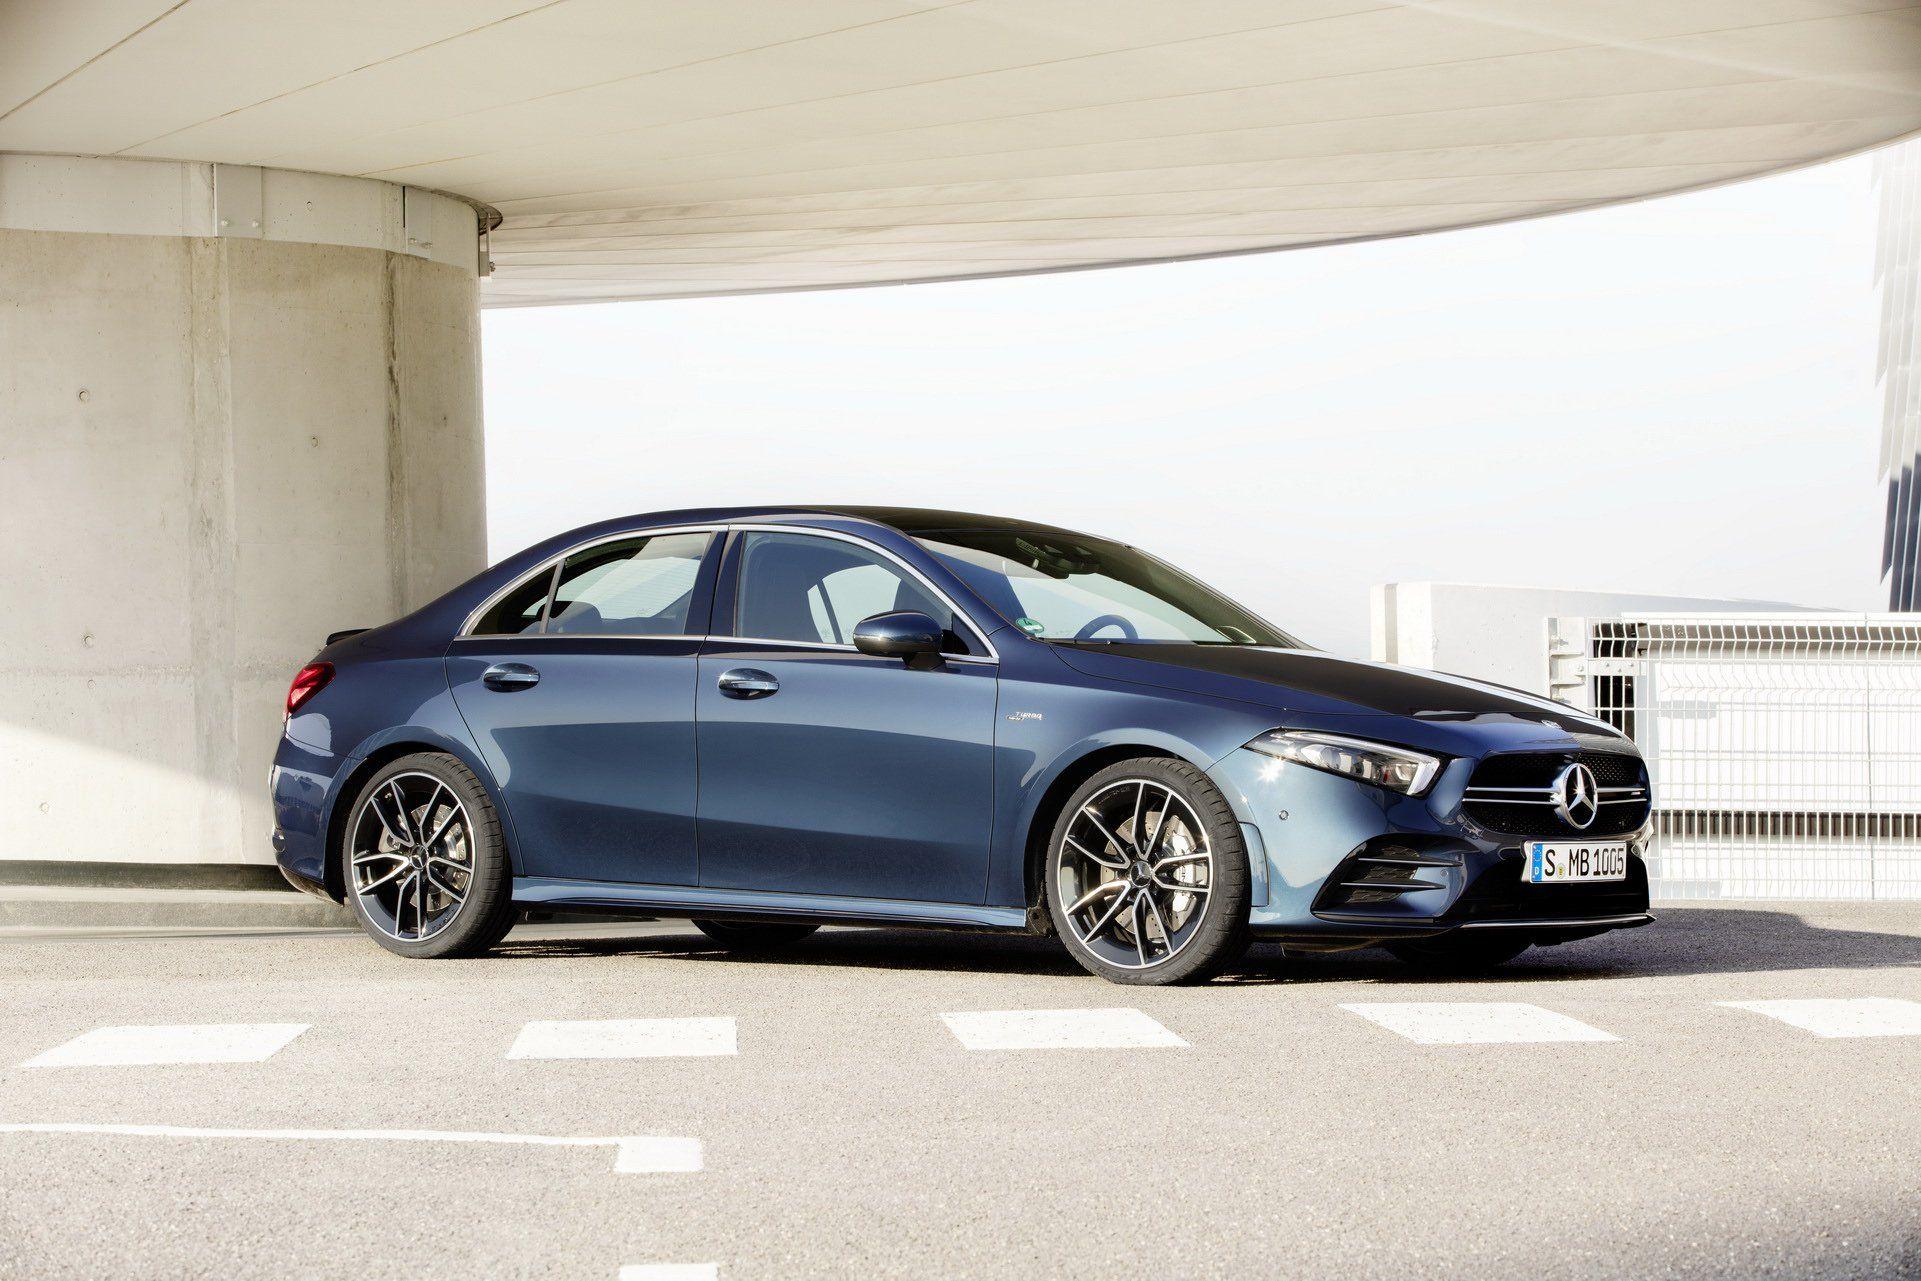 2020 Mercedes Amg A 35 Junior Performance Sedan Has 302 Hp Does 0